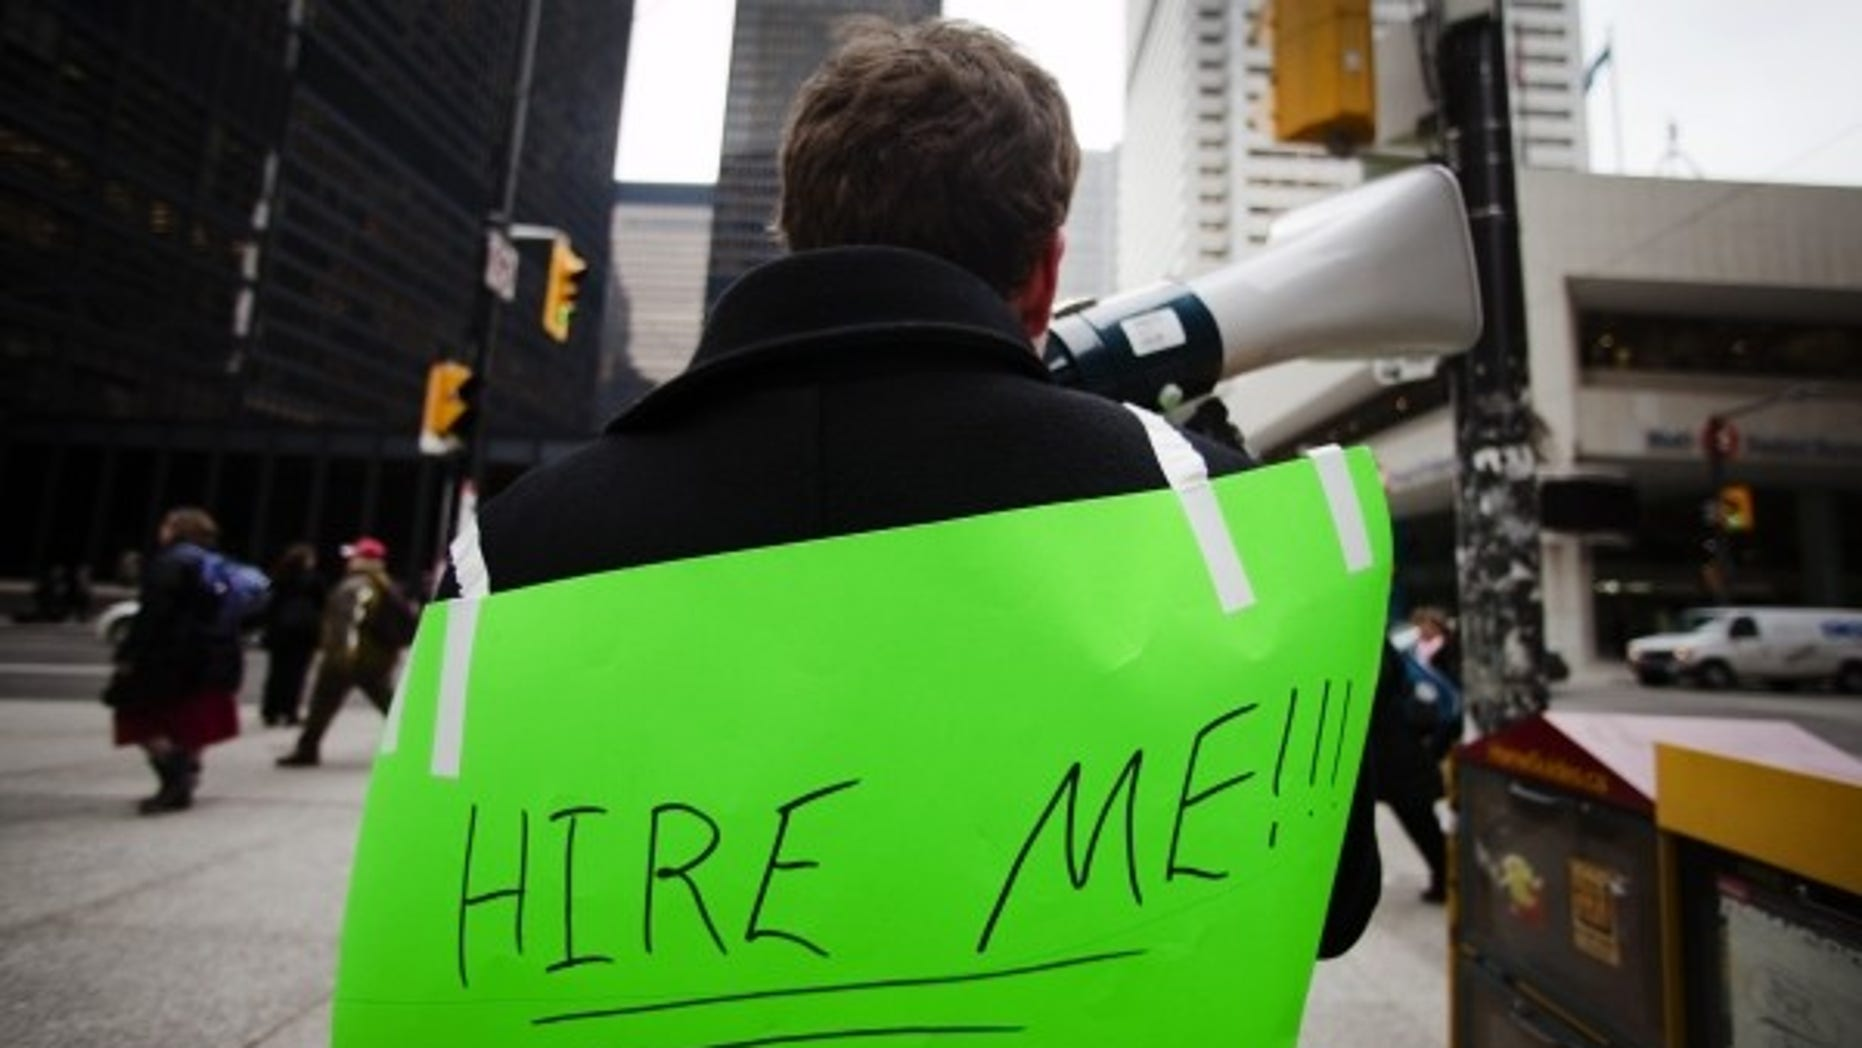 Unemployed person seeking a job